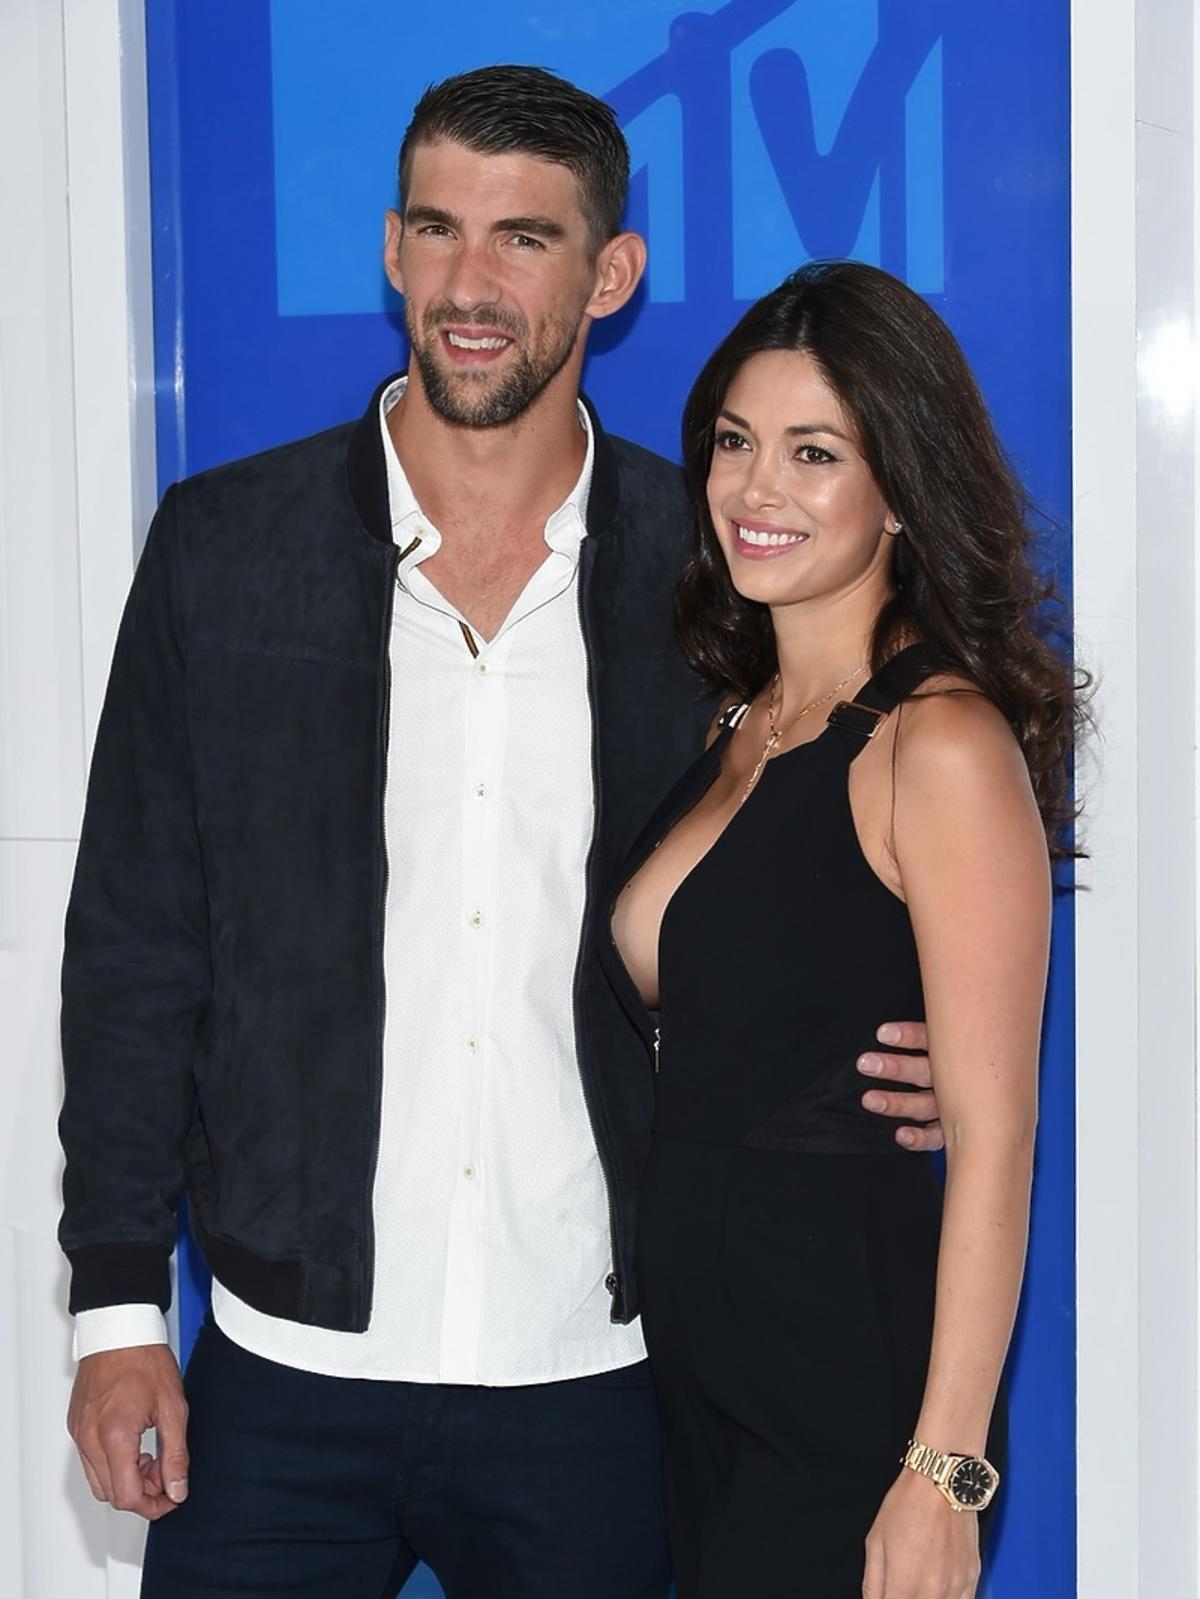 Gala MTV Video Music Awards 2016 Michael Phelps